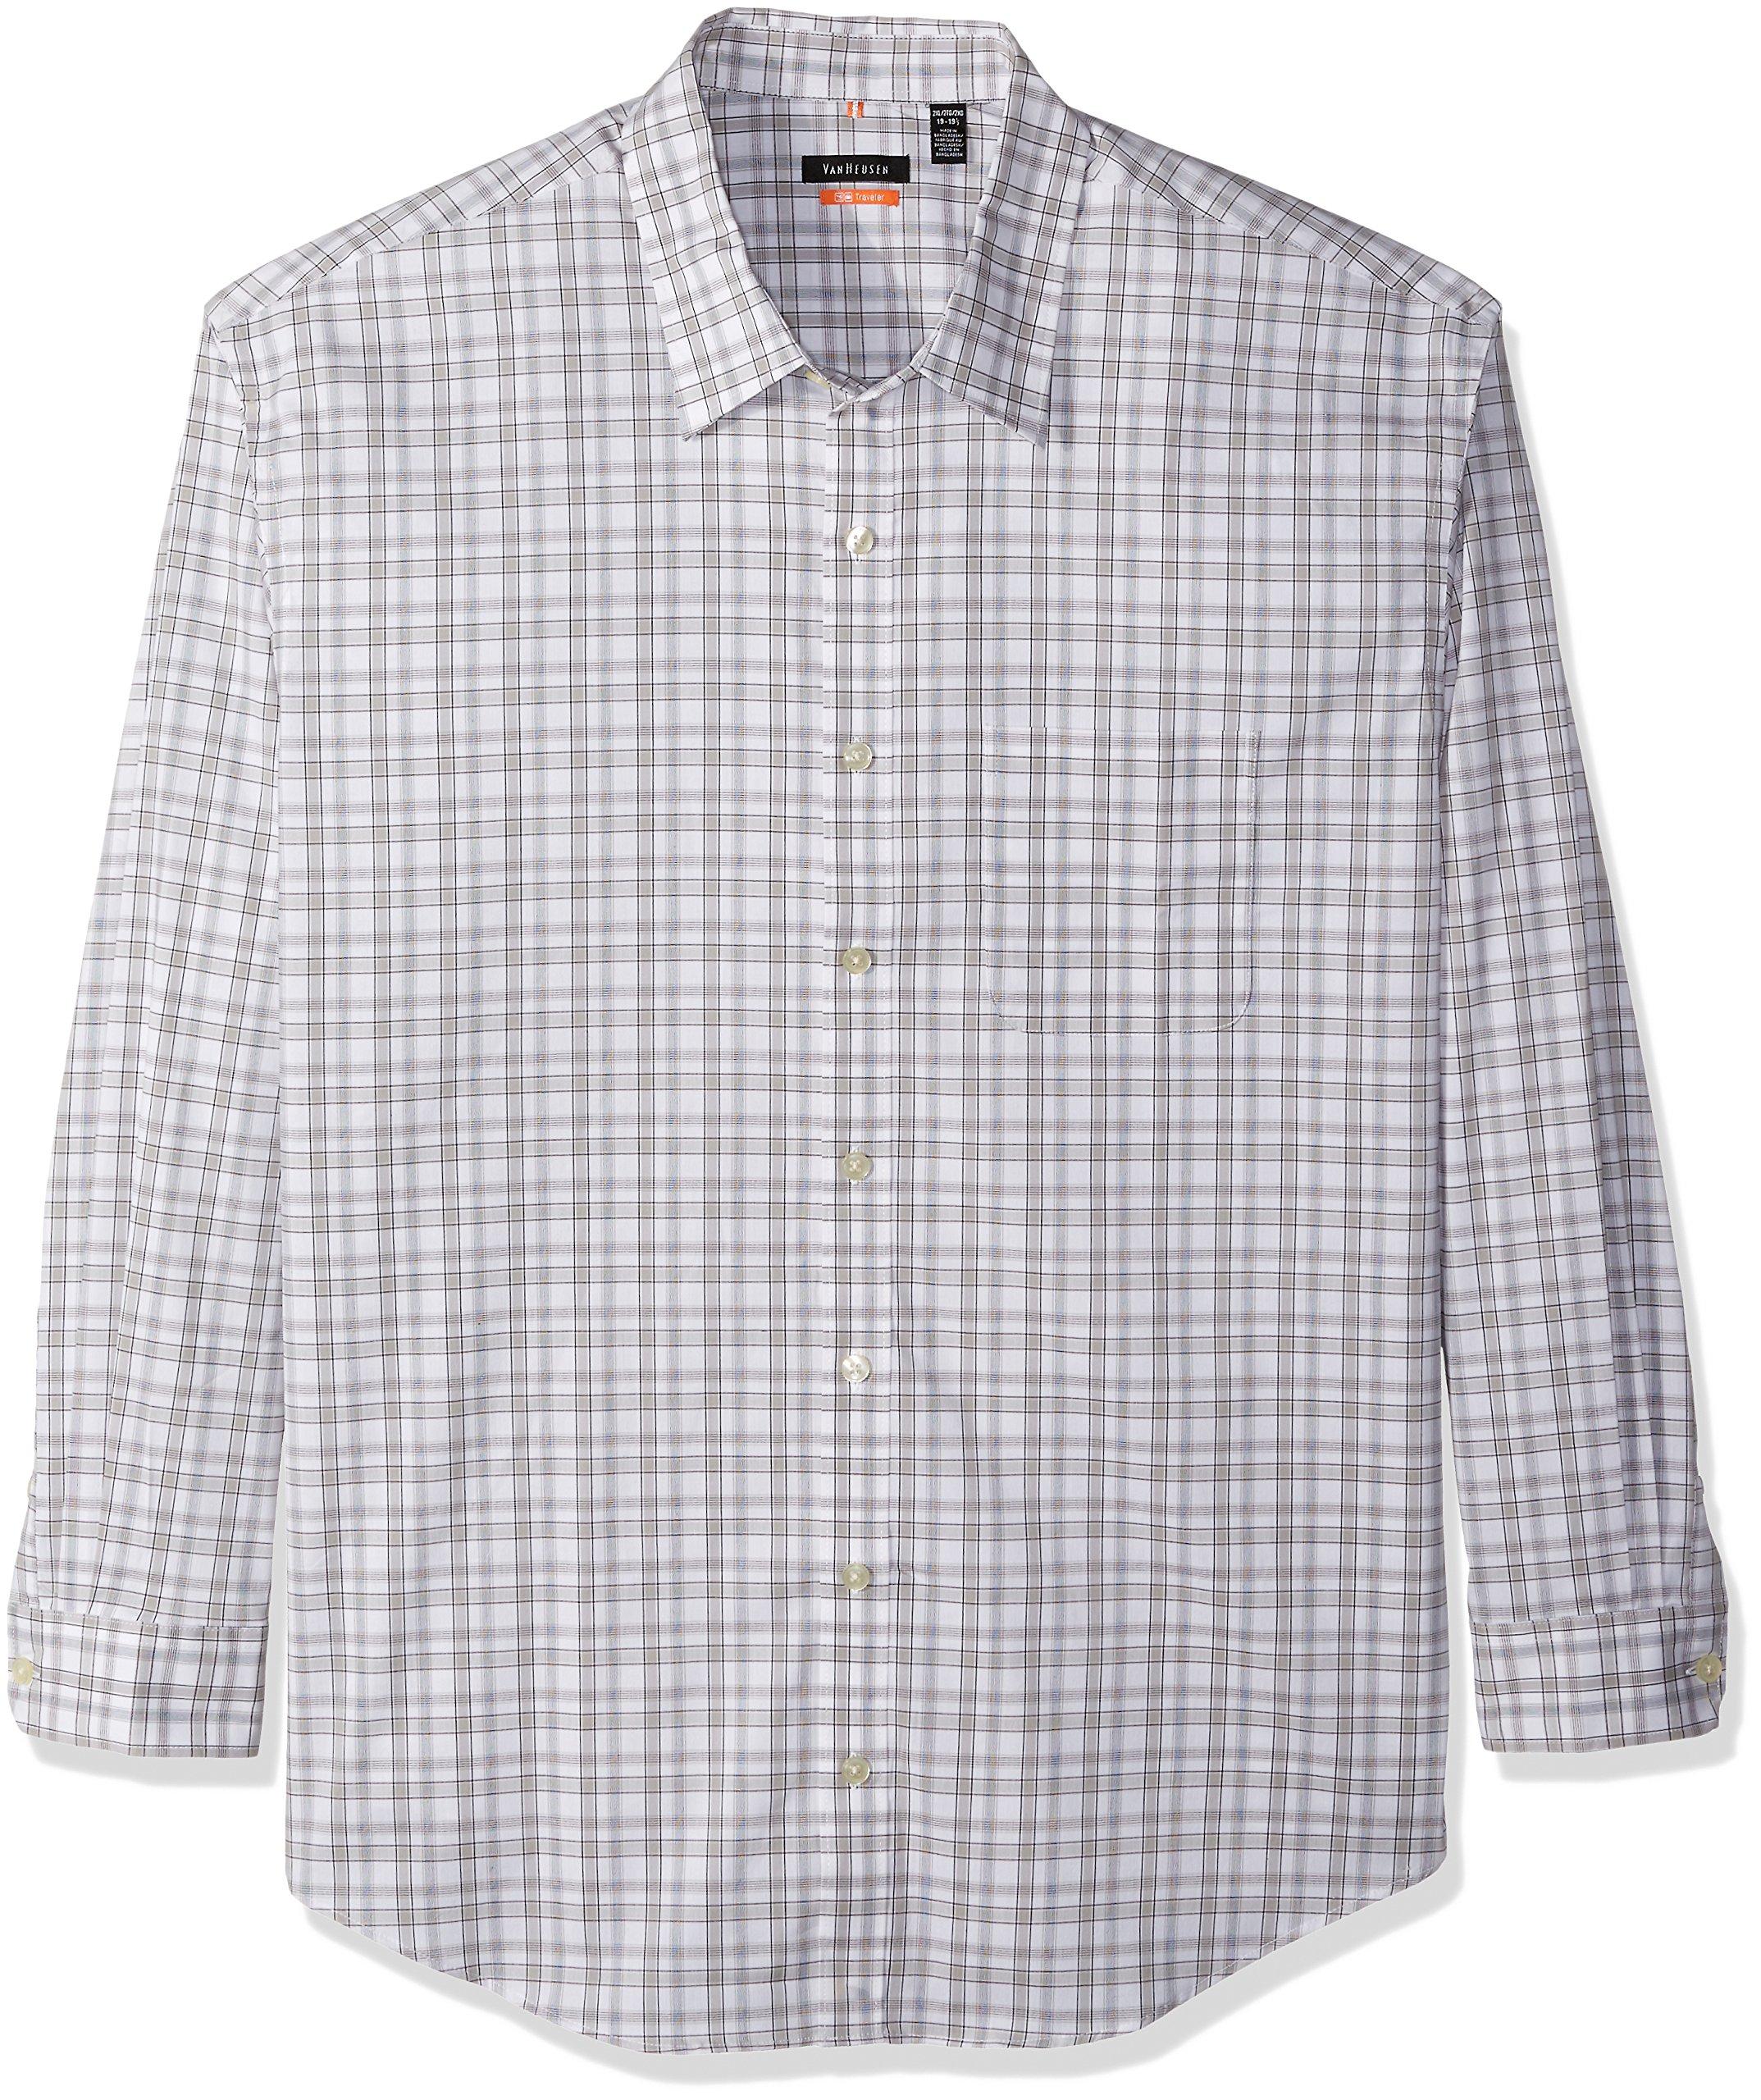 Van Heusen Men's Big and Tall Traveler Non Iron Stretch Long Sleeve Shirt, Mirage Gray, X-Large Tall